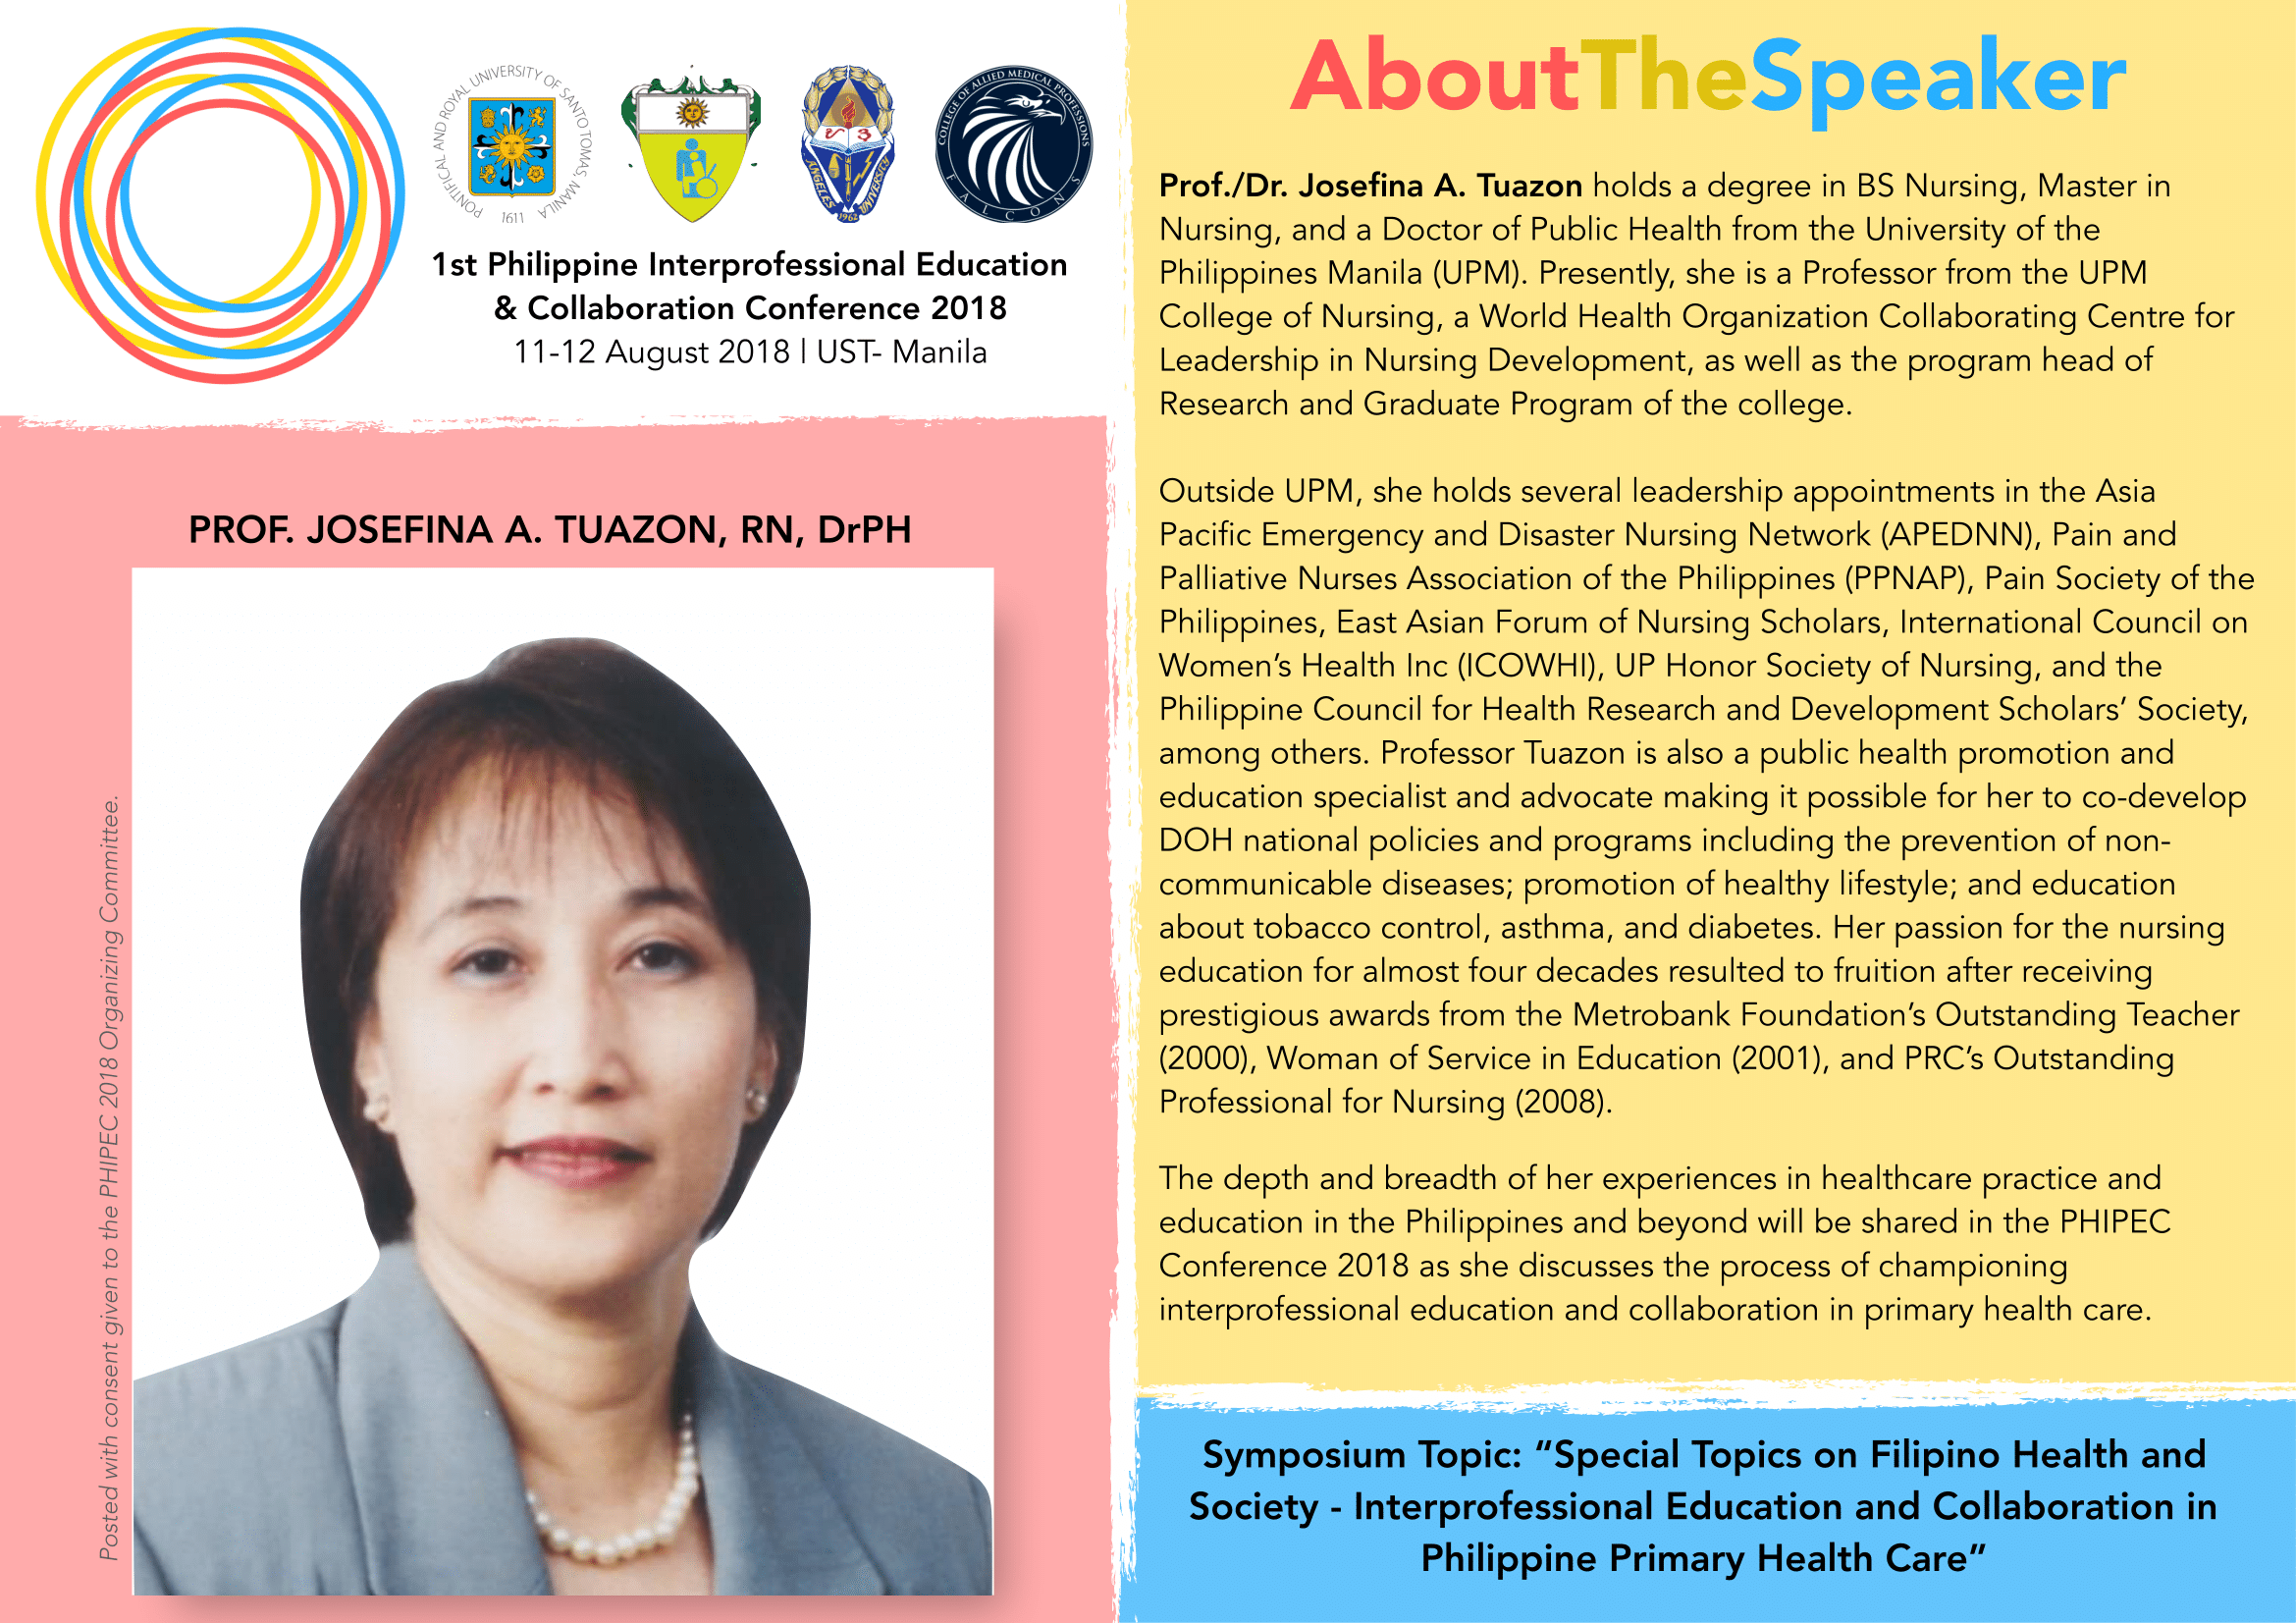 Prof. Josefina A. Tuazon, DrPH, RN